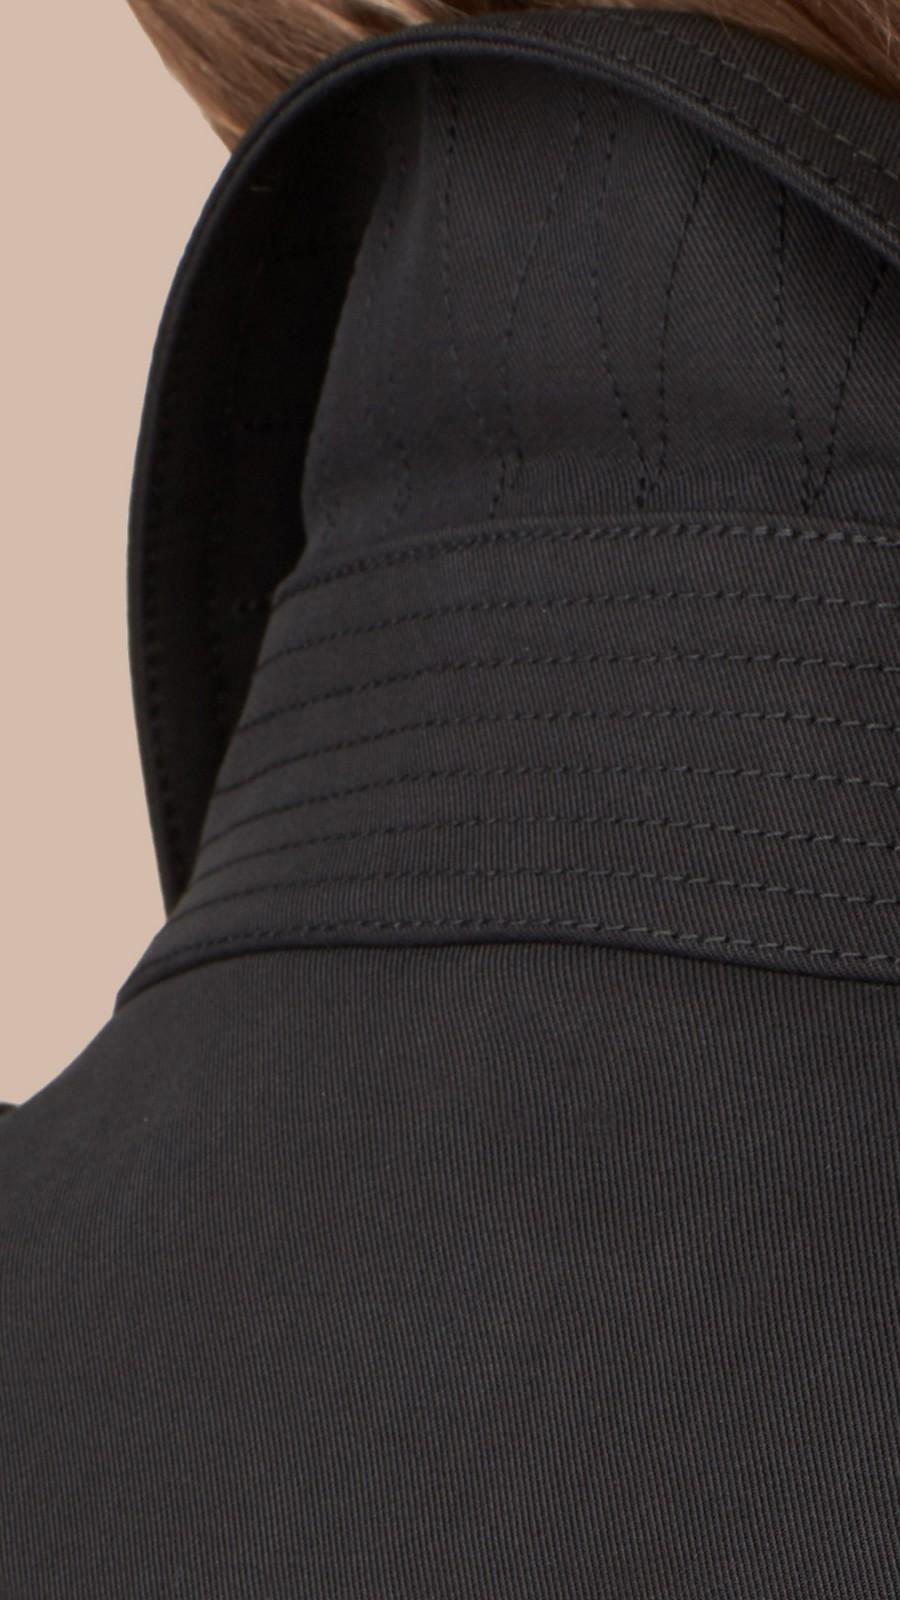 Black Cotton Gabardine Trench Coat Black - Image 2